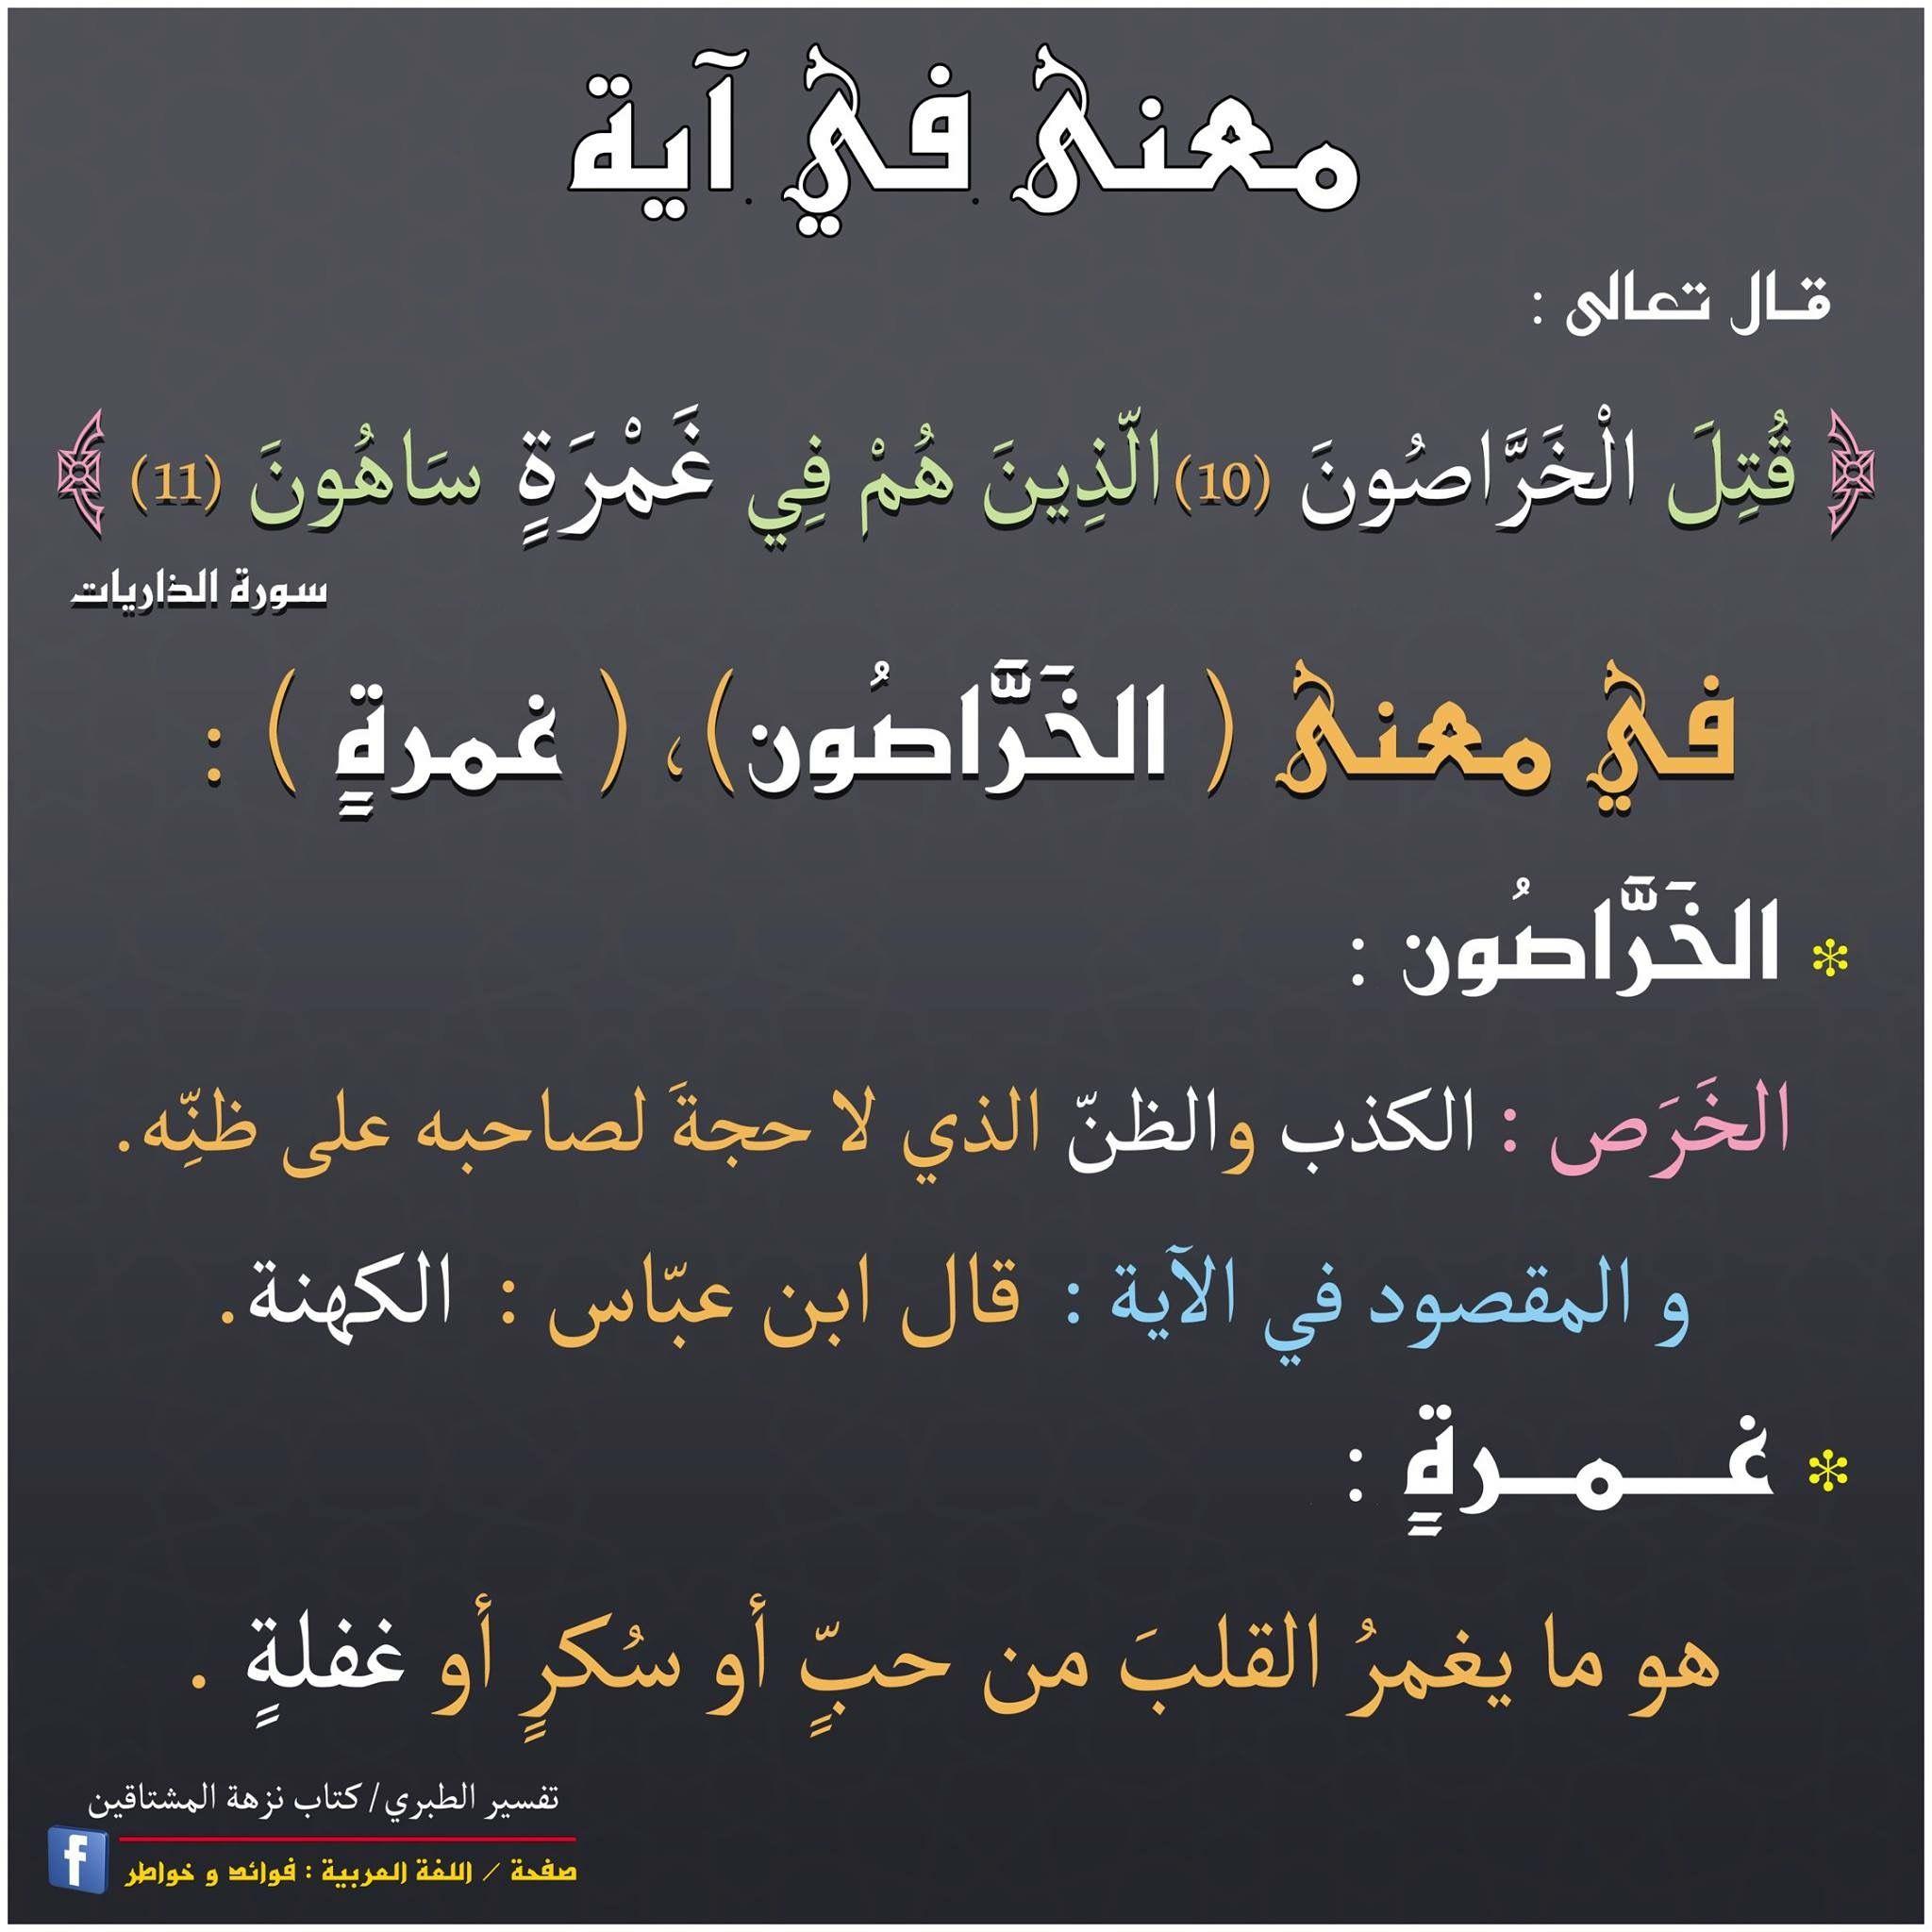 Pin By Beyaz Siyah On ٥١ سورة الذاريات Islamic Quotes Islamic Quotes Quran Arabic Quotes